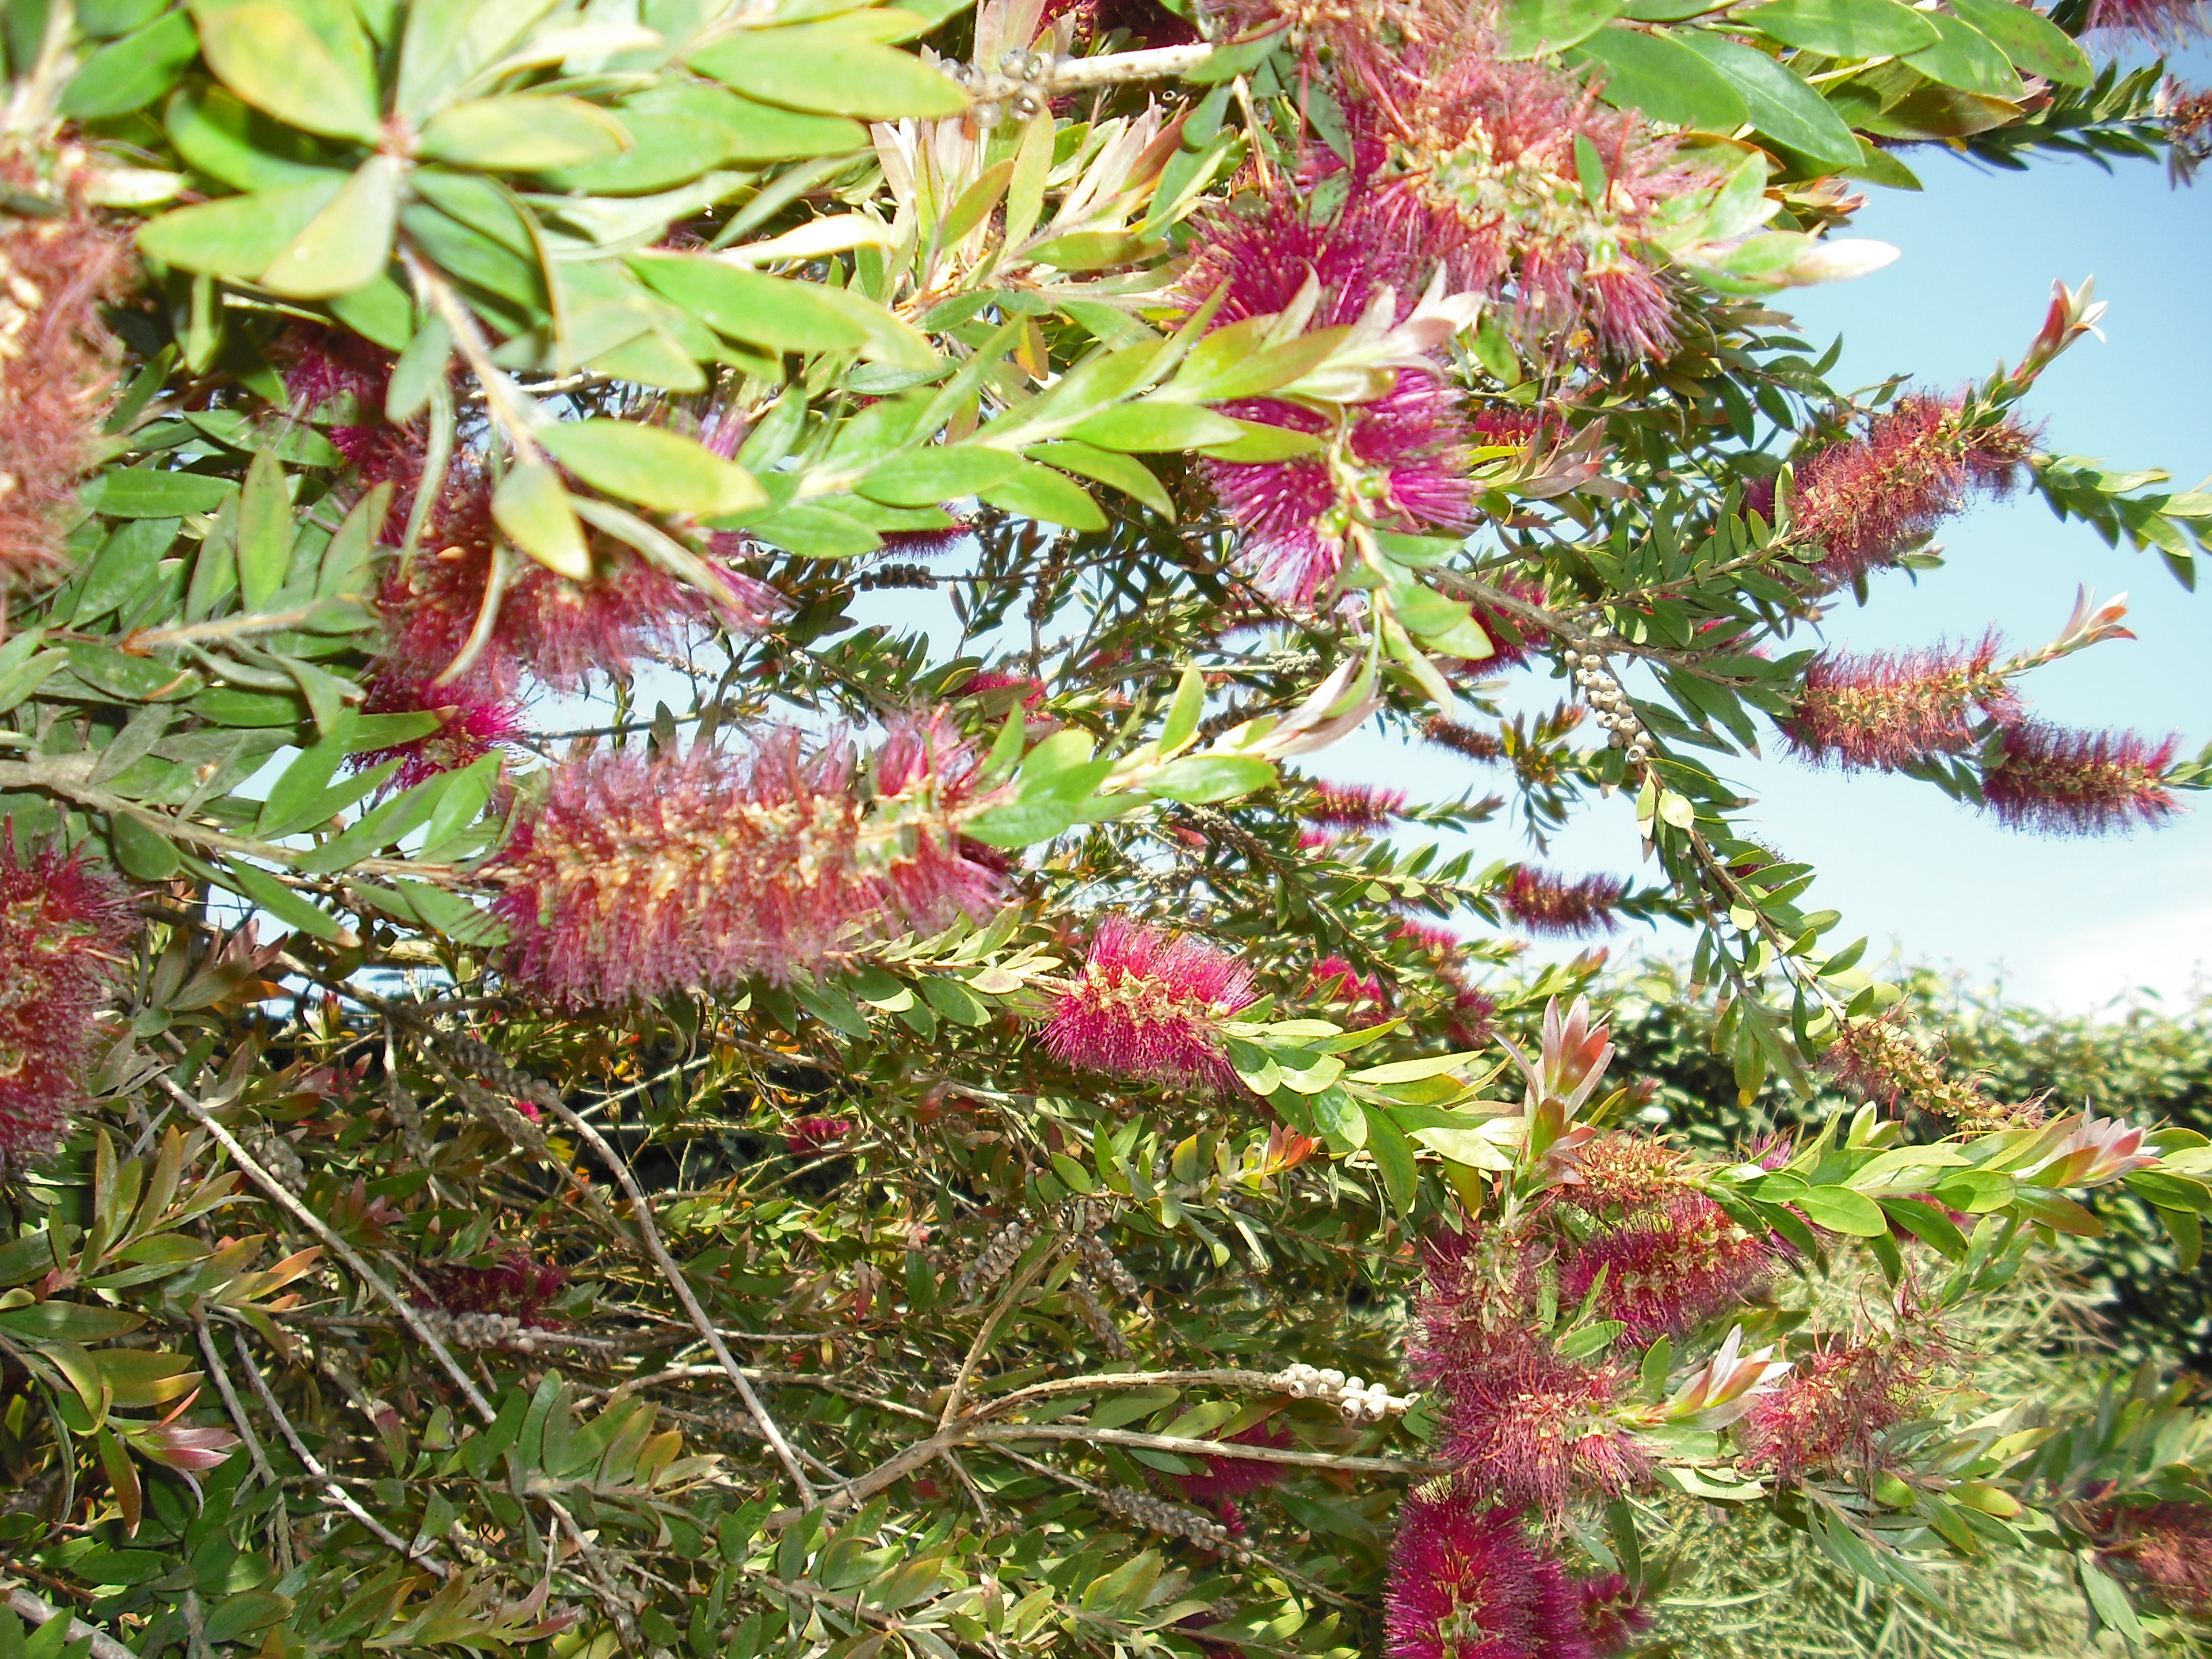 Photo Arbuste Decoratif Aveccfeuillage Persistant